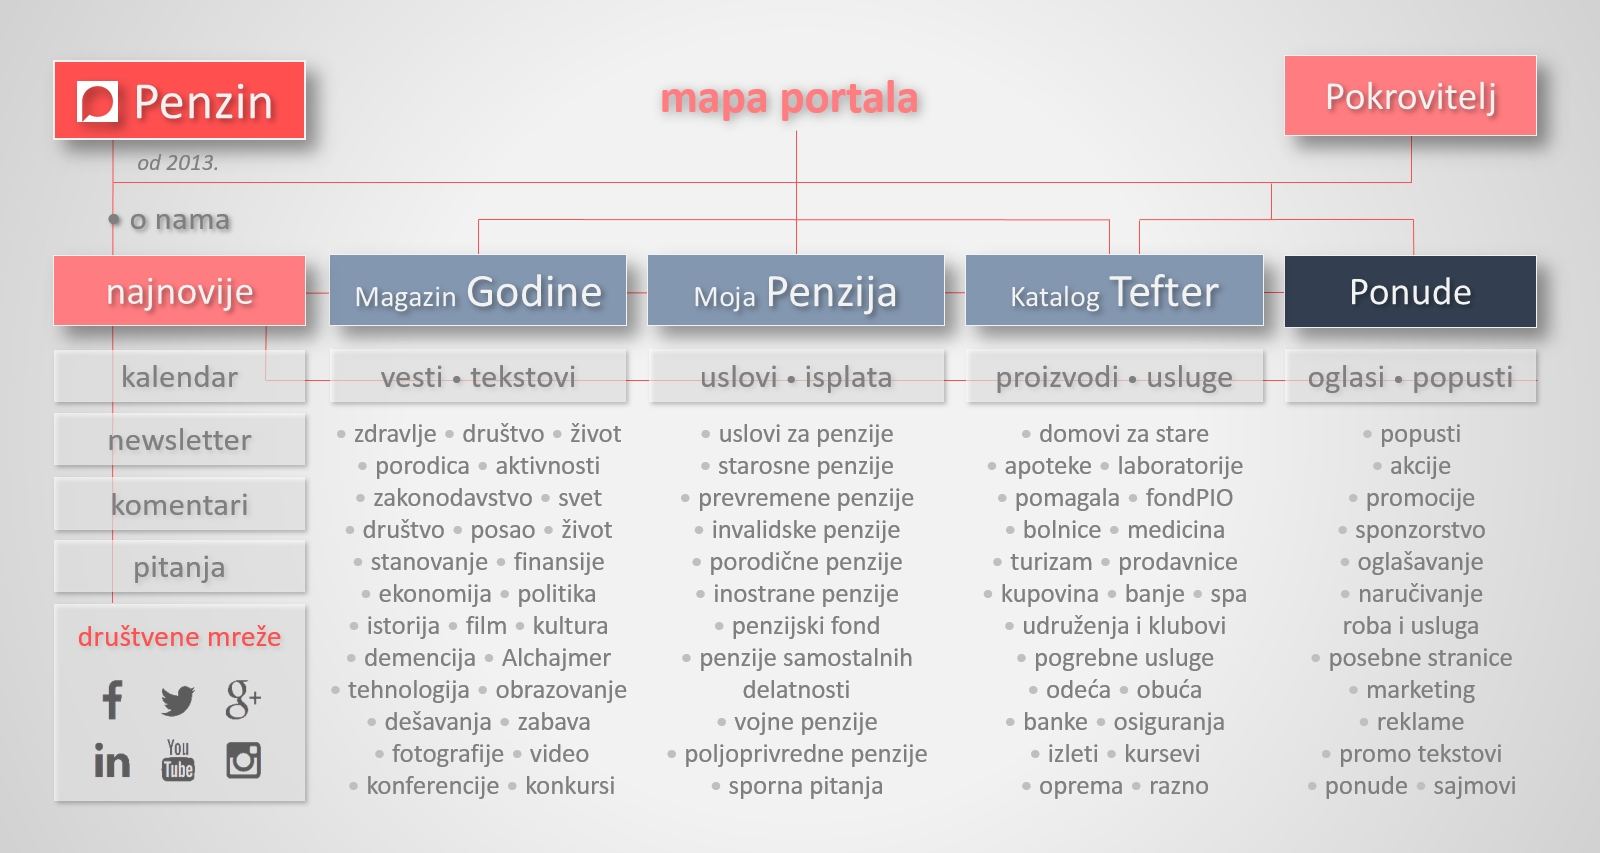 Slika: Mapa portala Penzin